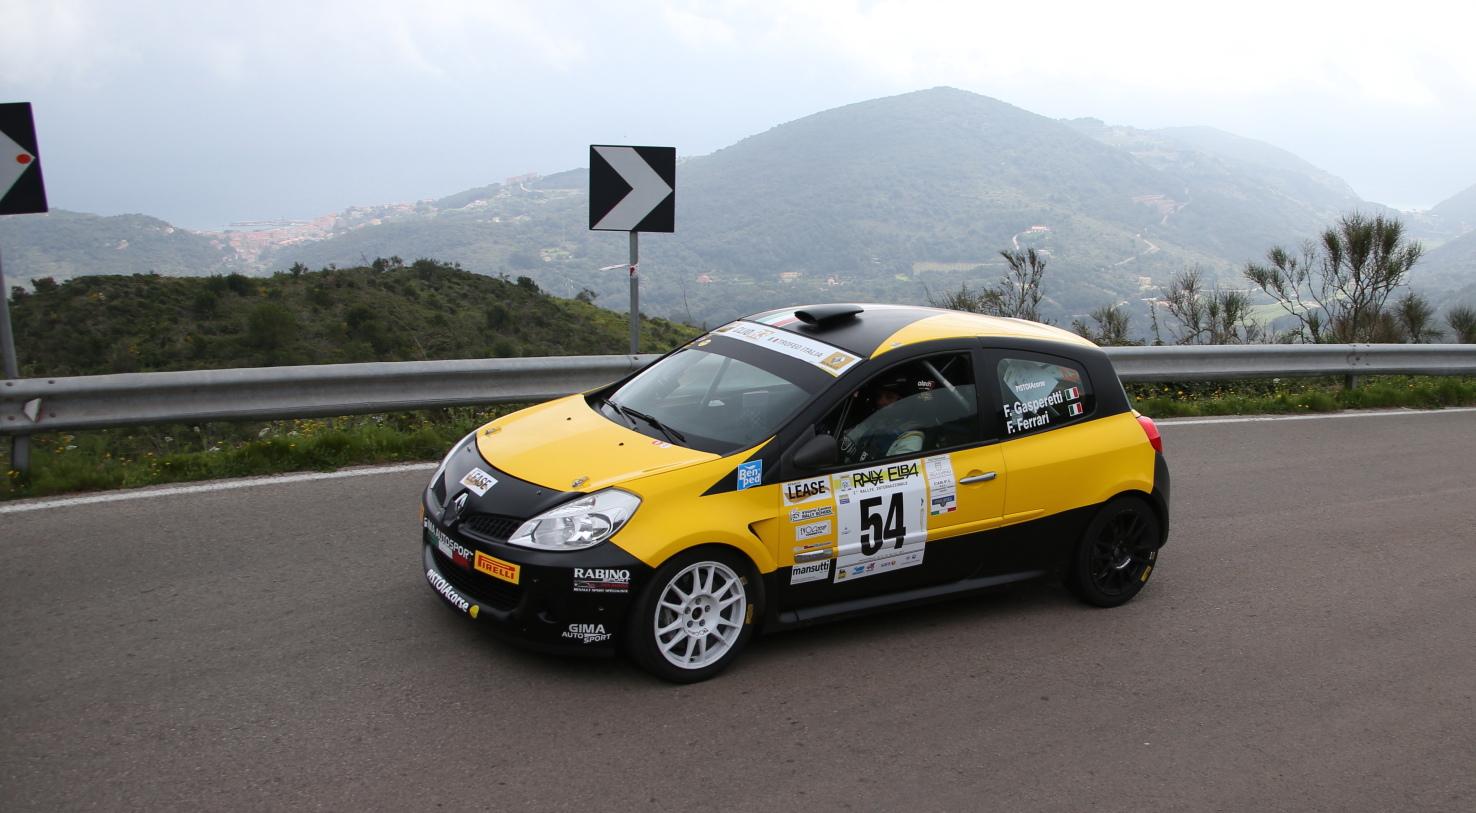 Trofei Renault IRC all'Elba: i vincitori